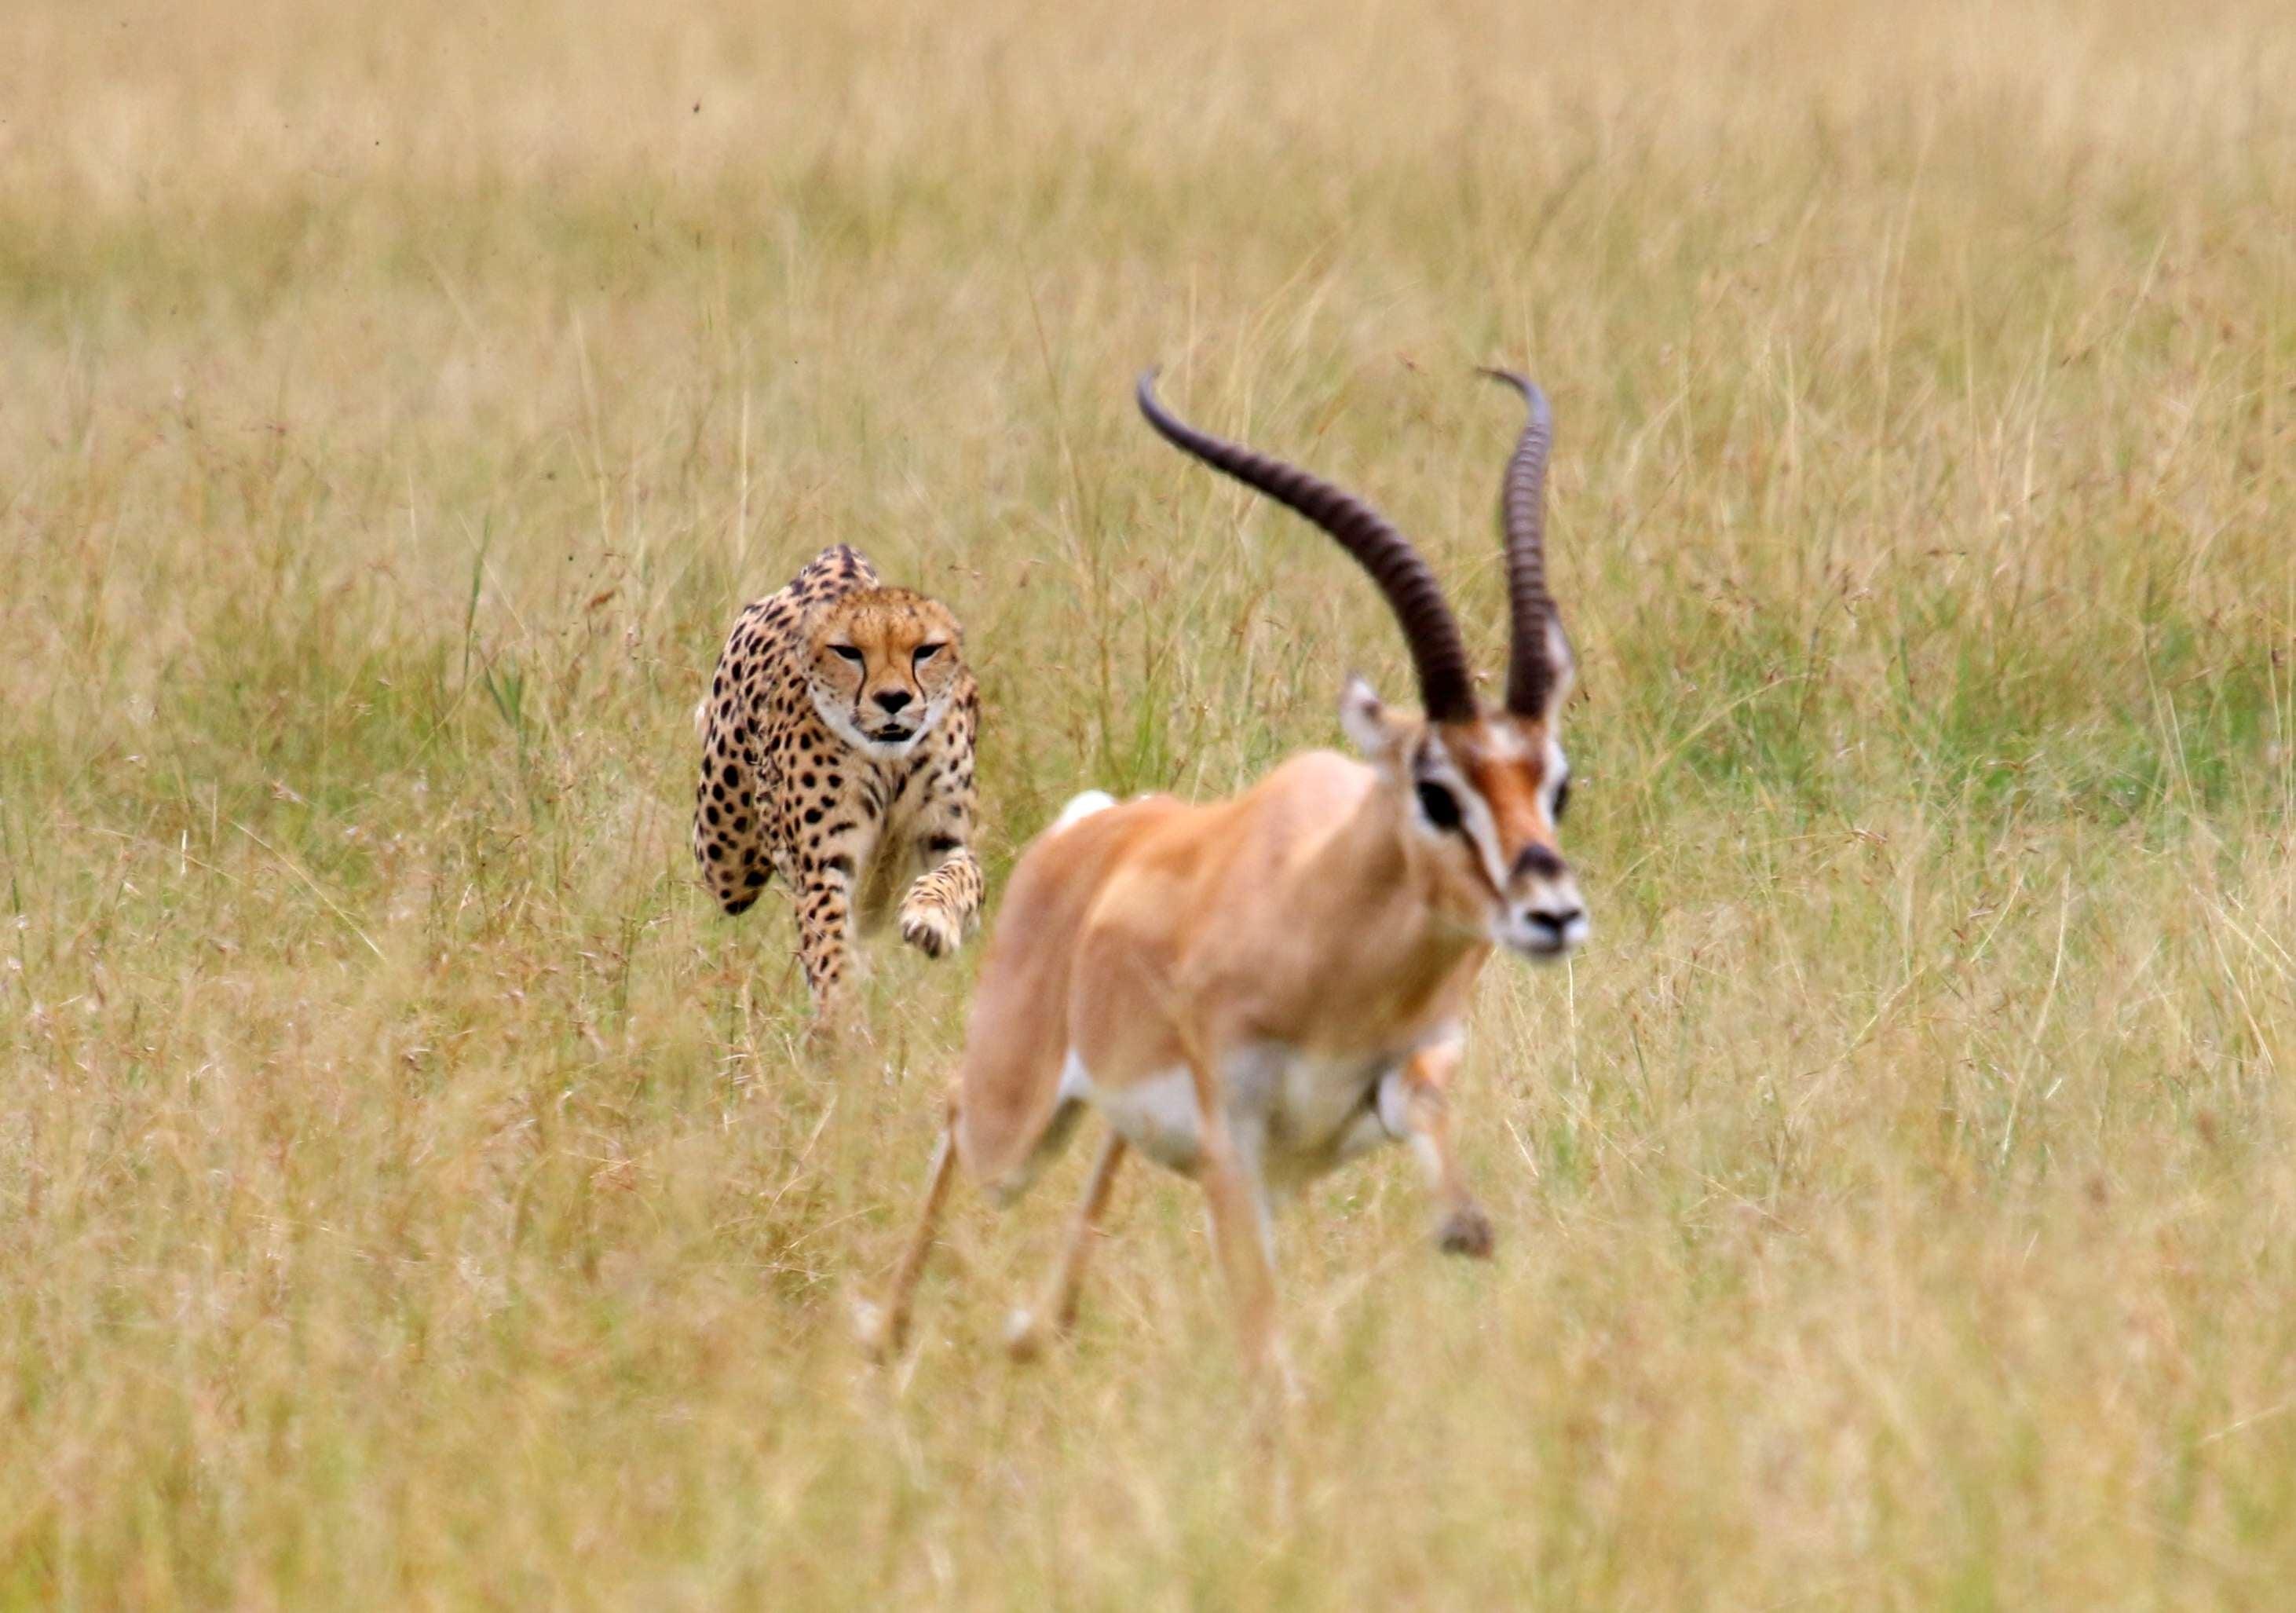 Cheetah Chasing Impala On Grassy Field